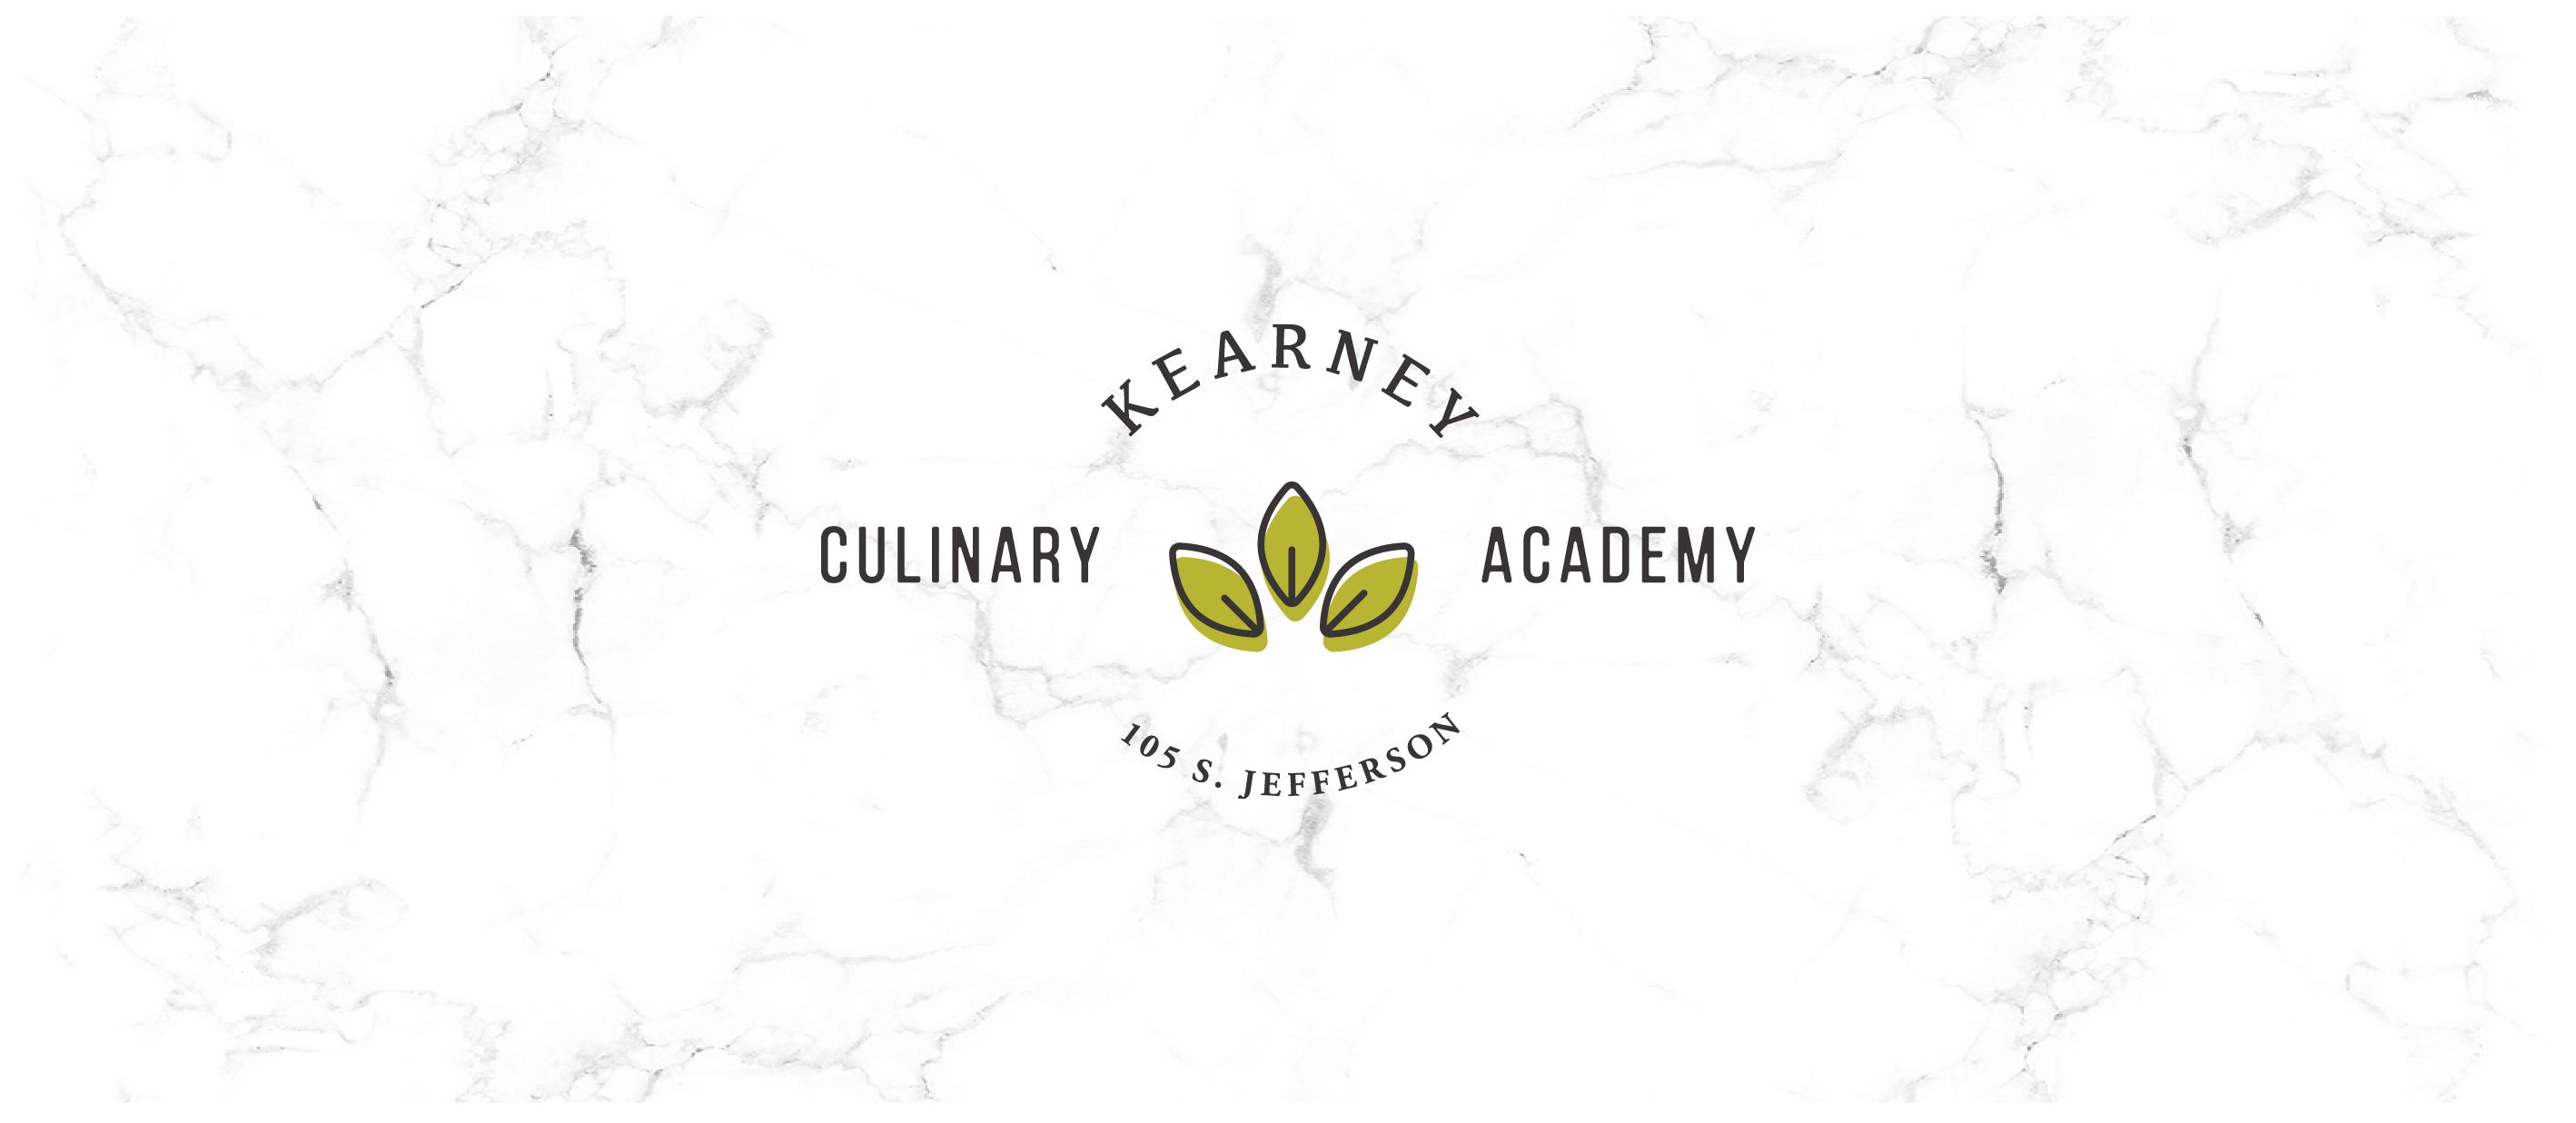 Kearney Culinary Academy Primary logo design